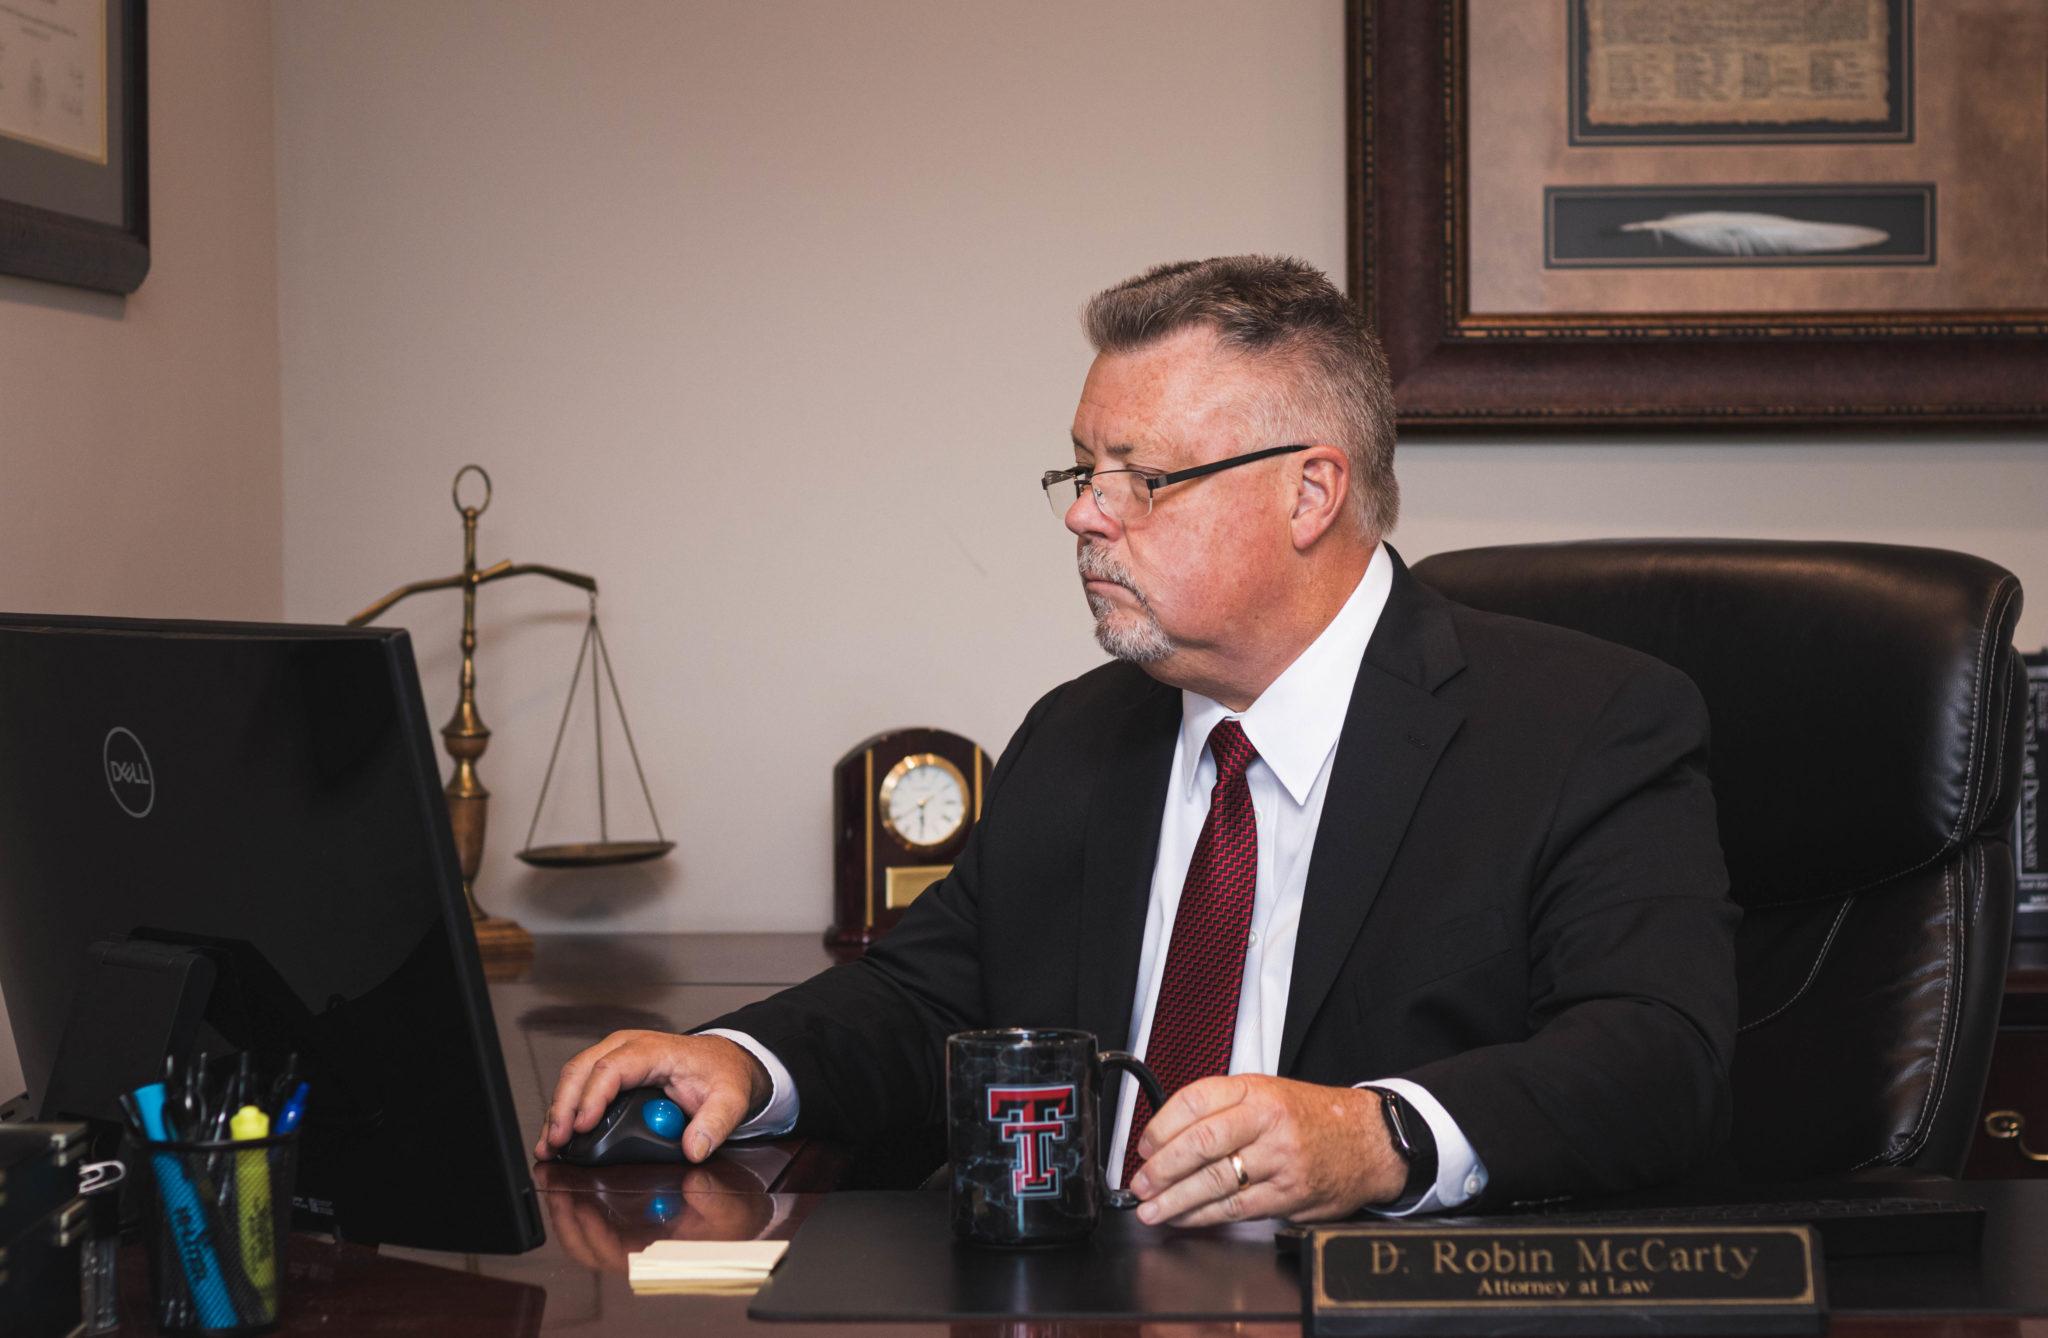 Robin McCarty represents defendants in Texas